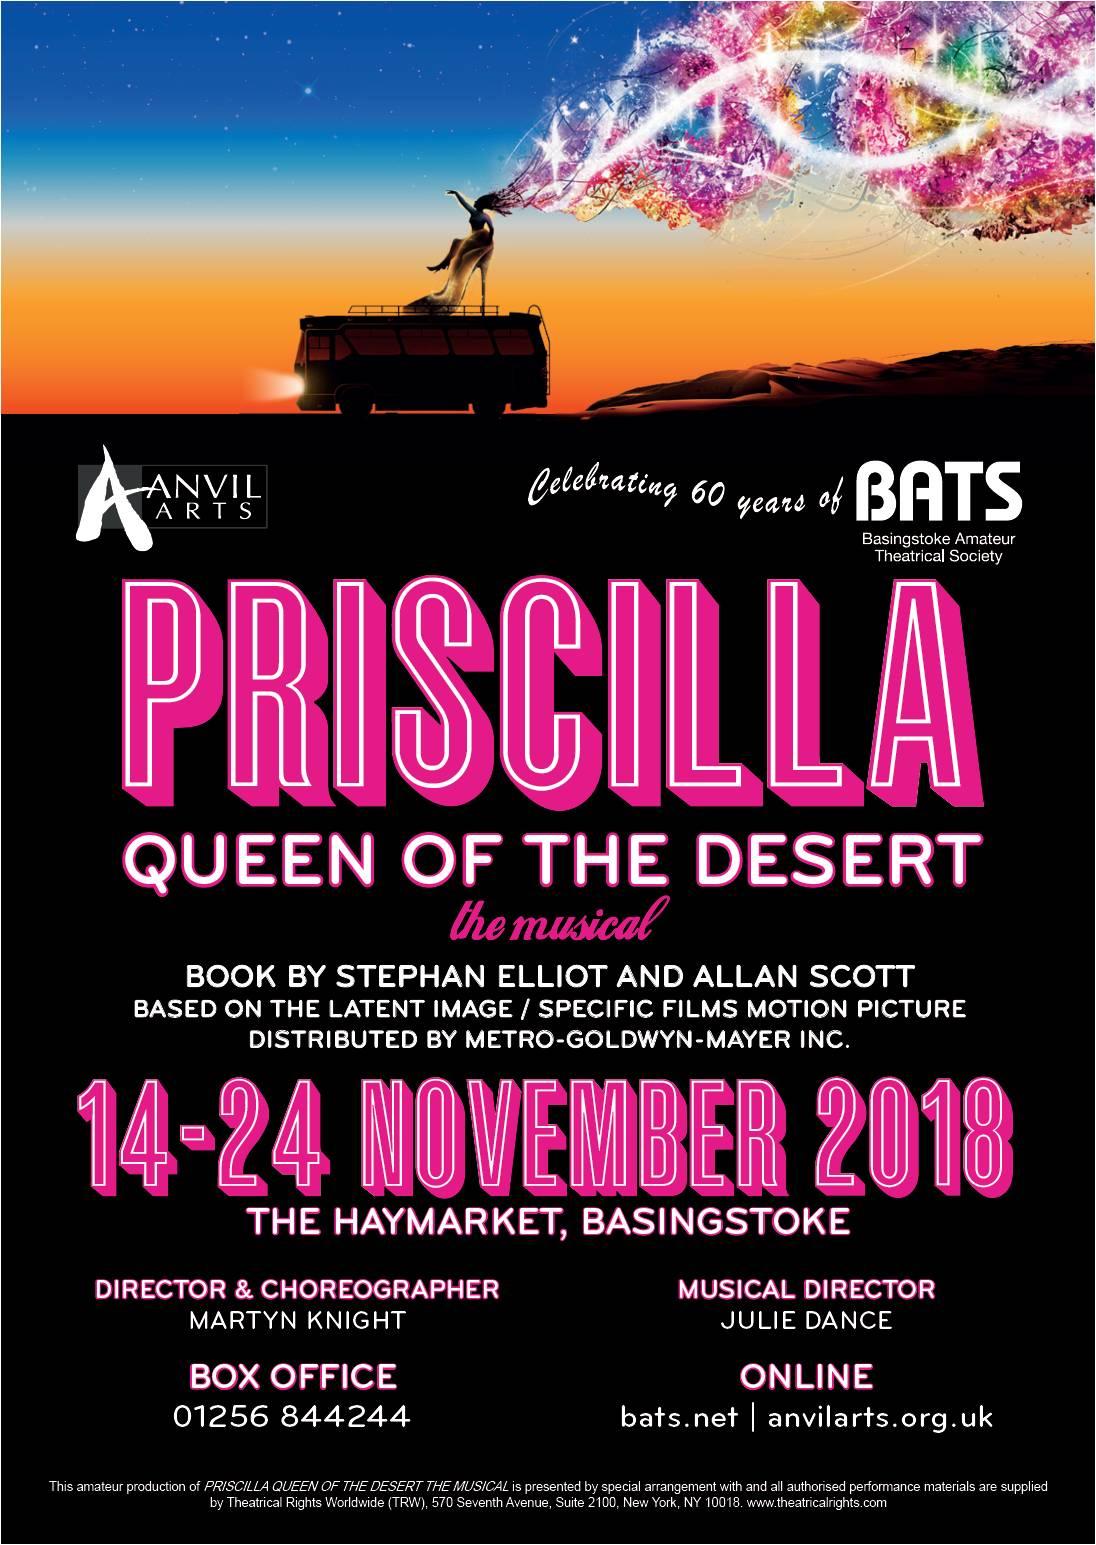 Priscilla Queen of the Desert - Nov 2018